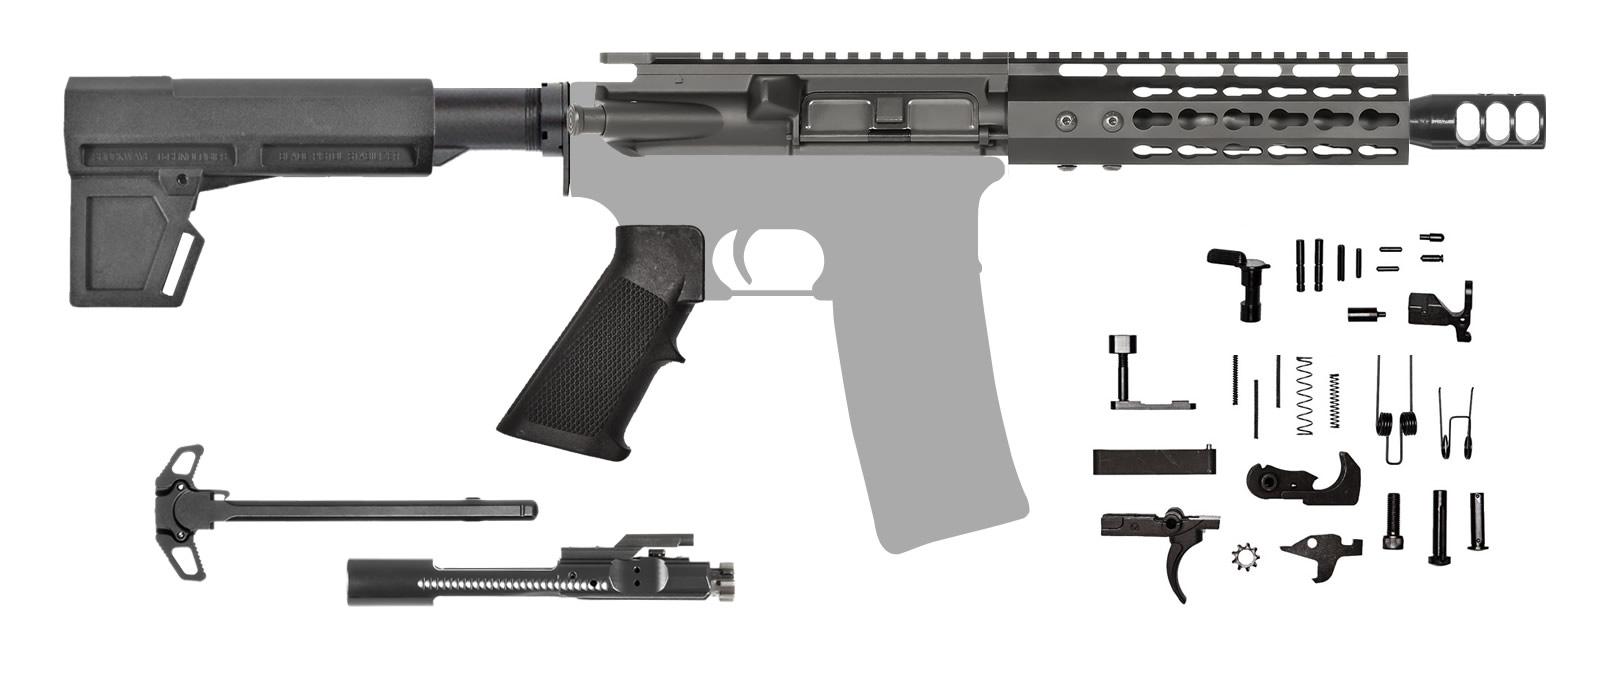 AR-15 Pistol Kit .223 NATO Keymod with Shockwave Blade